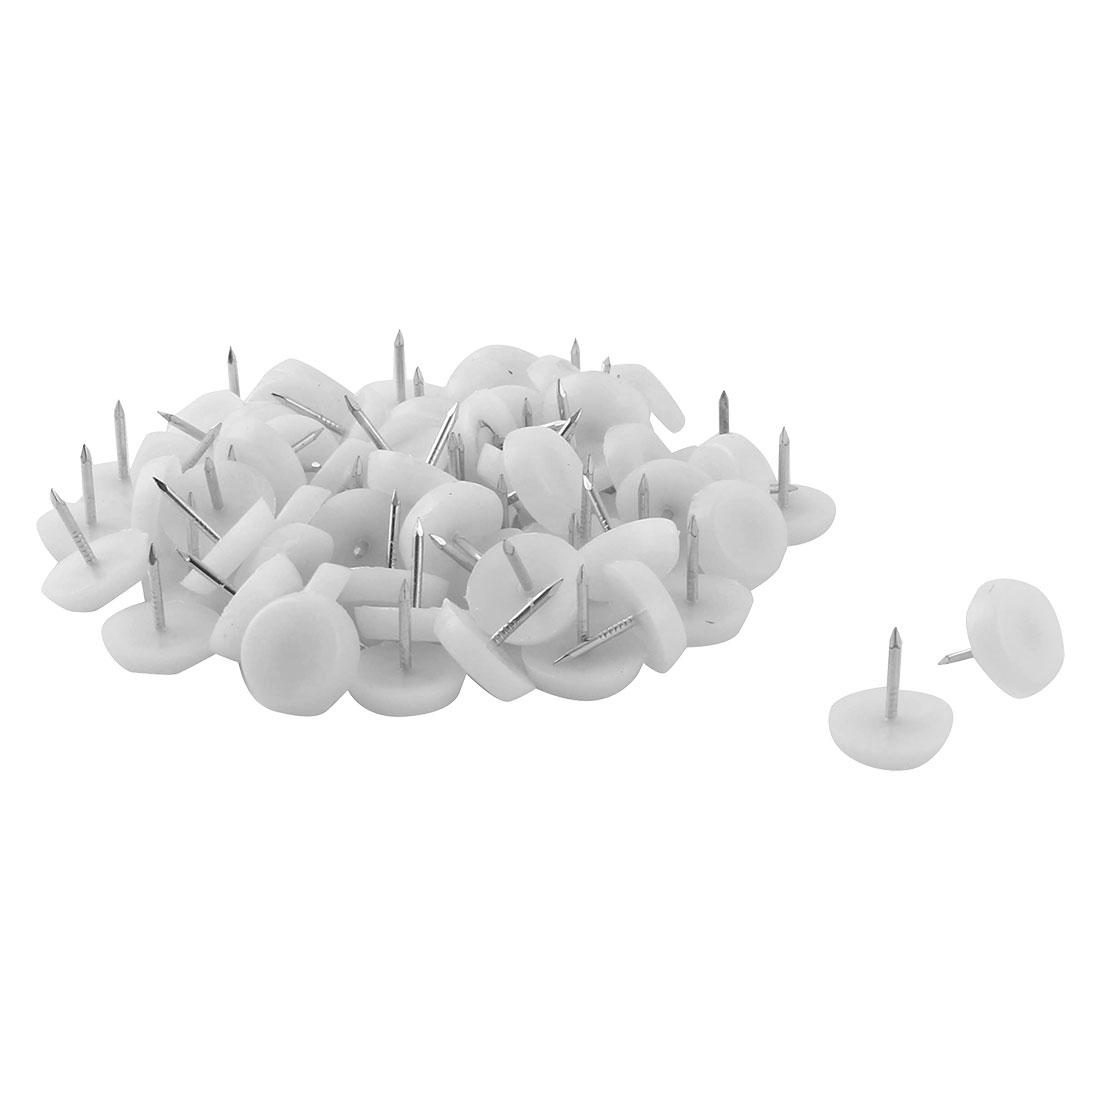 Furniture Chair Table Plastic Leg Feet Protector Non-slip Nails White 17mm Dia 80pcs